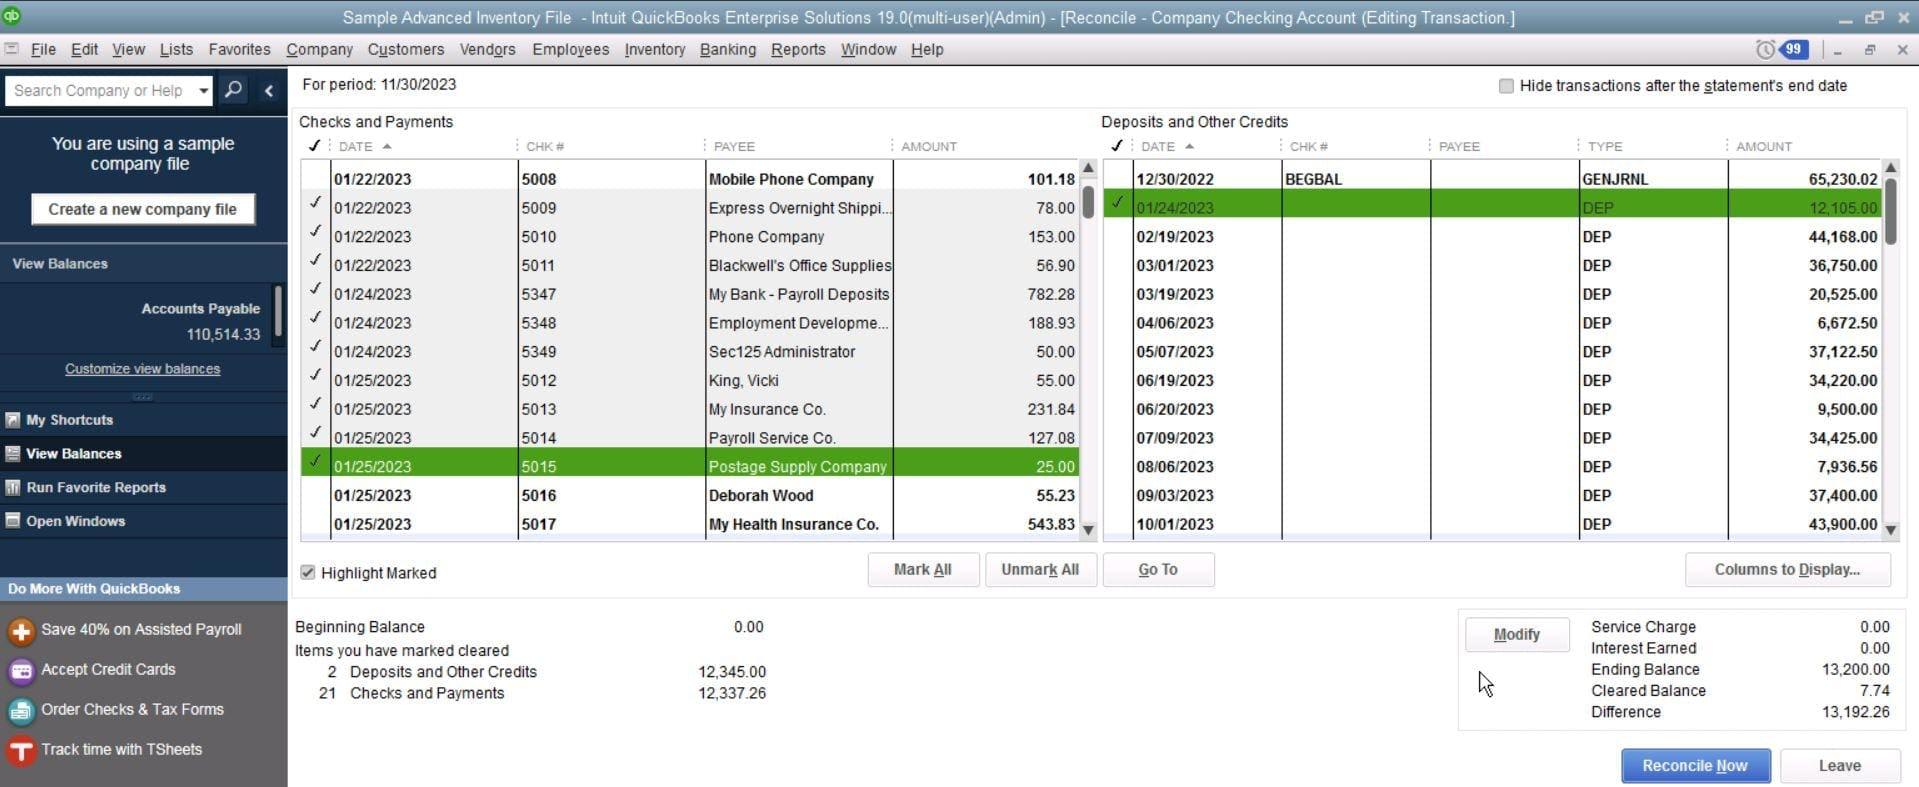 QuickBooks Desktop Enterprise Software - QuickBooks Enterprise Check and Payments